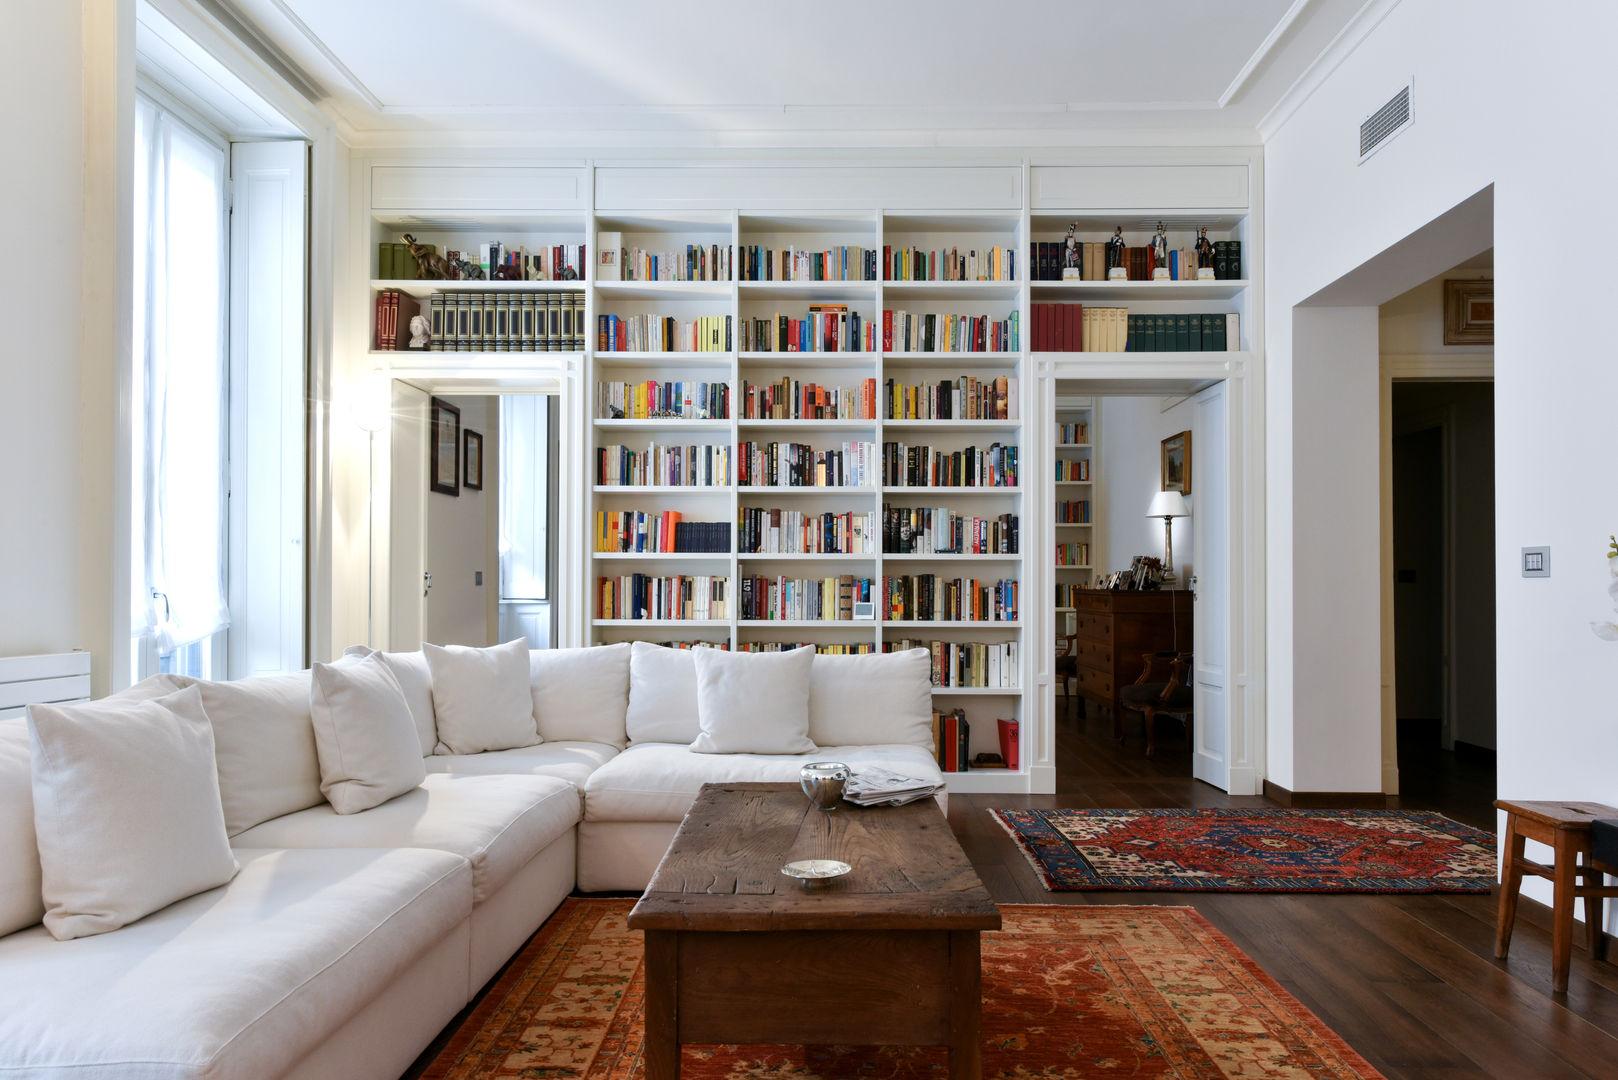 Preferenza Interior Design Ideas, Redecorating & Remodeling Photos | homify OX56